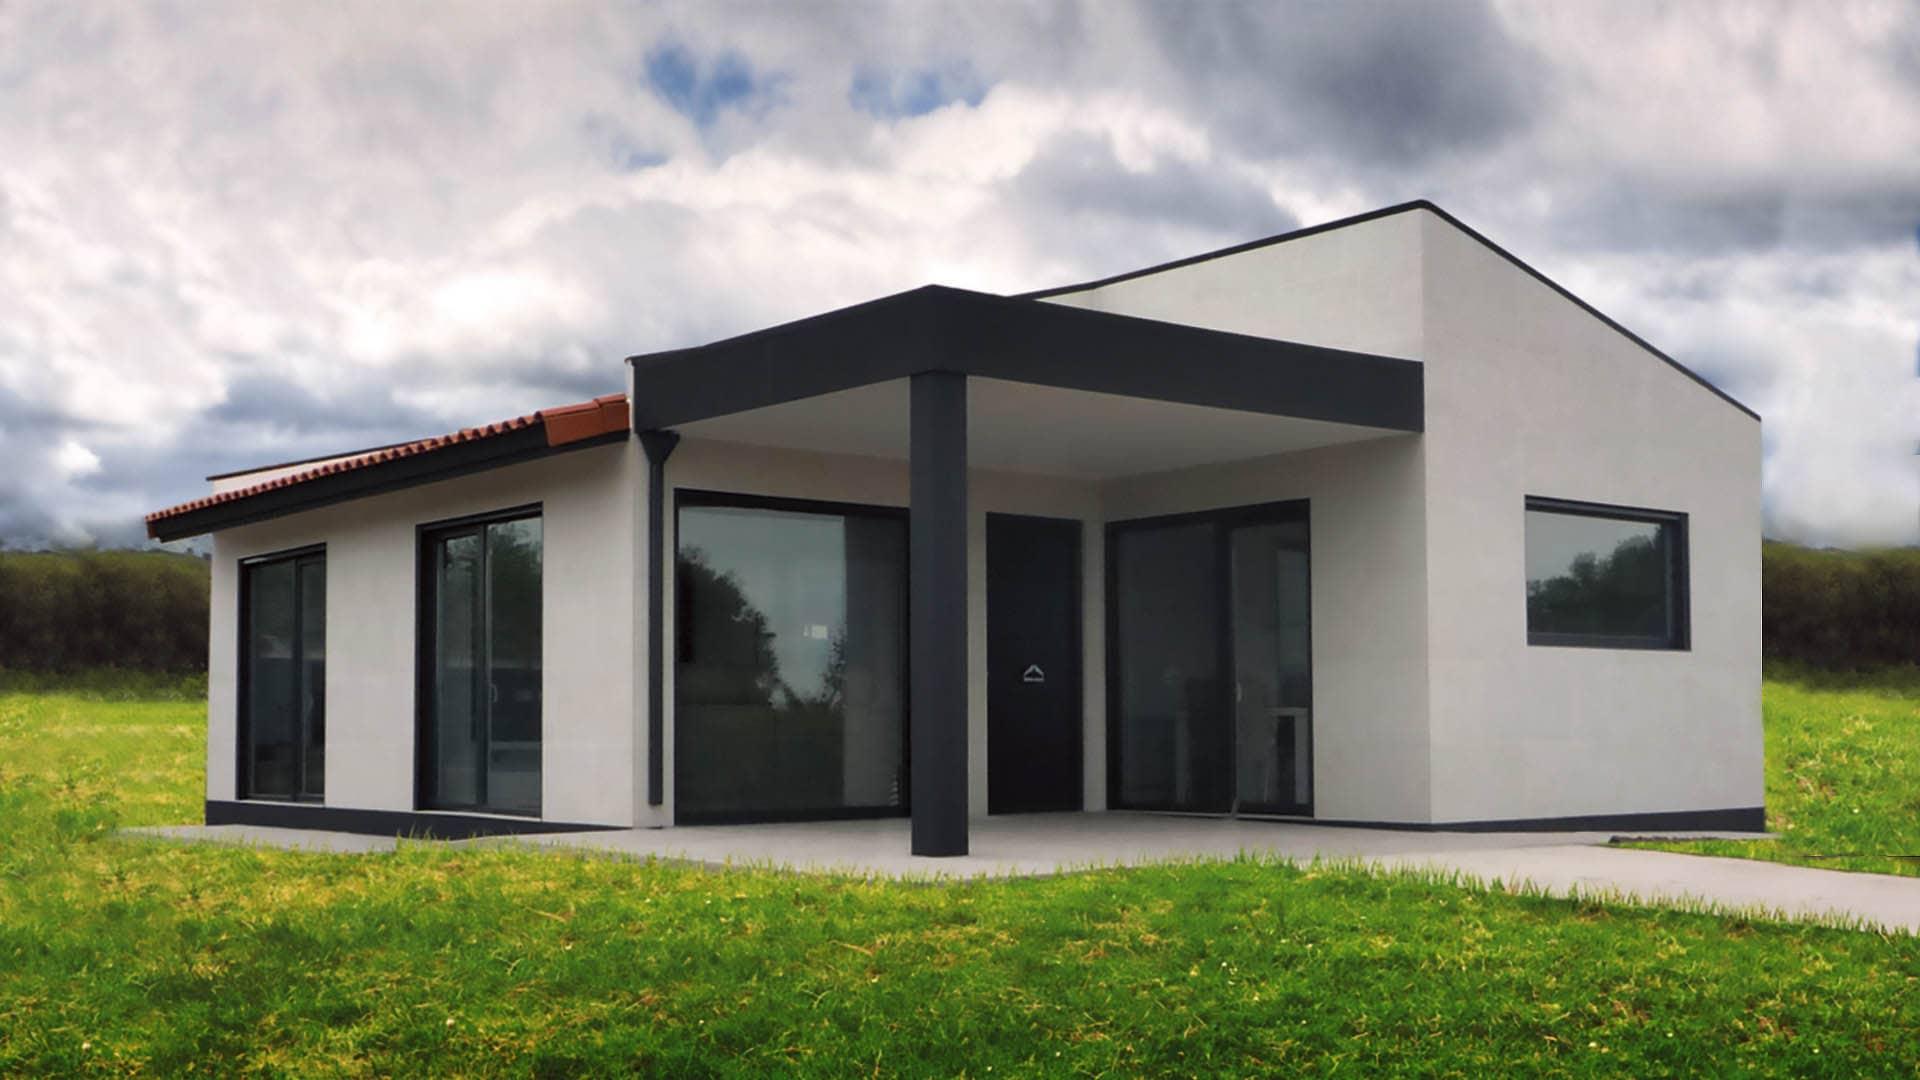 Casas Prefabricadas Y Casas Modulares Cofitor